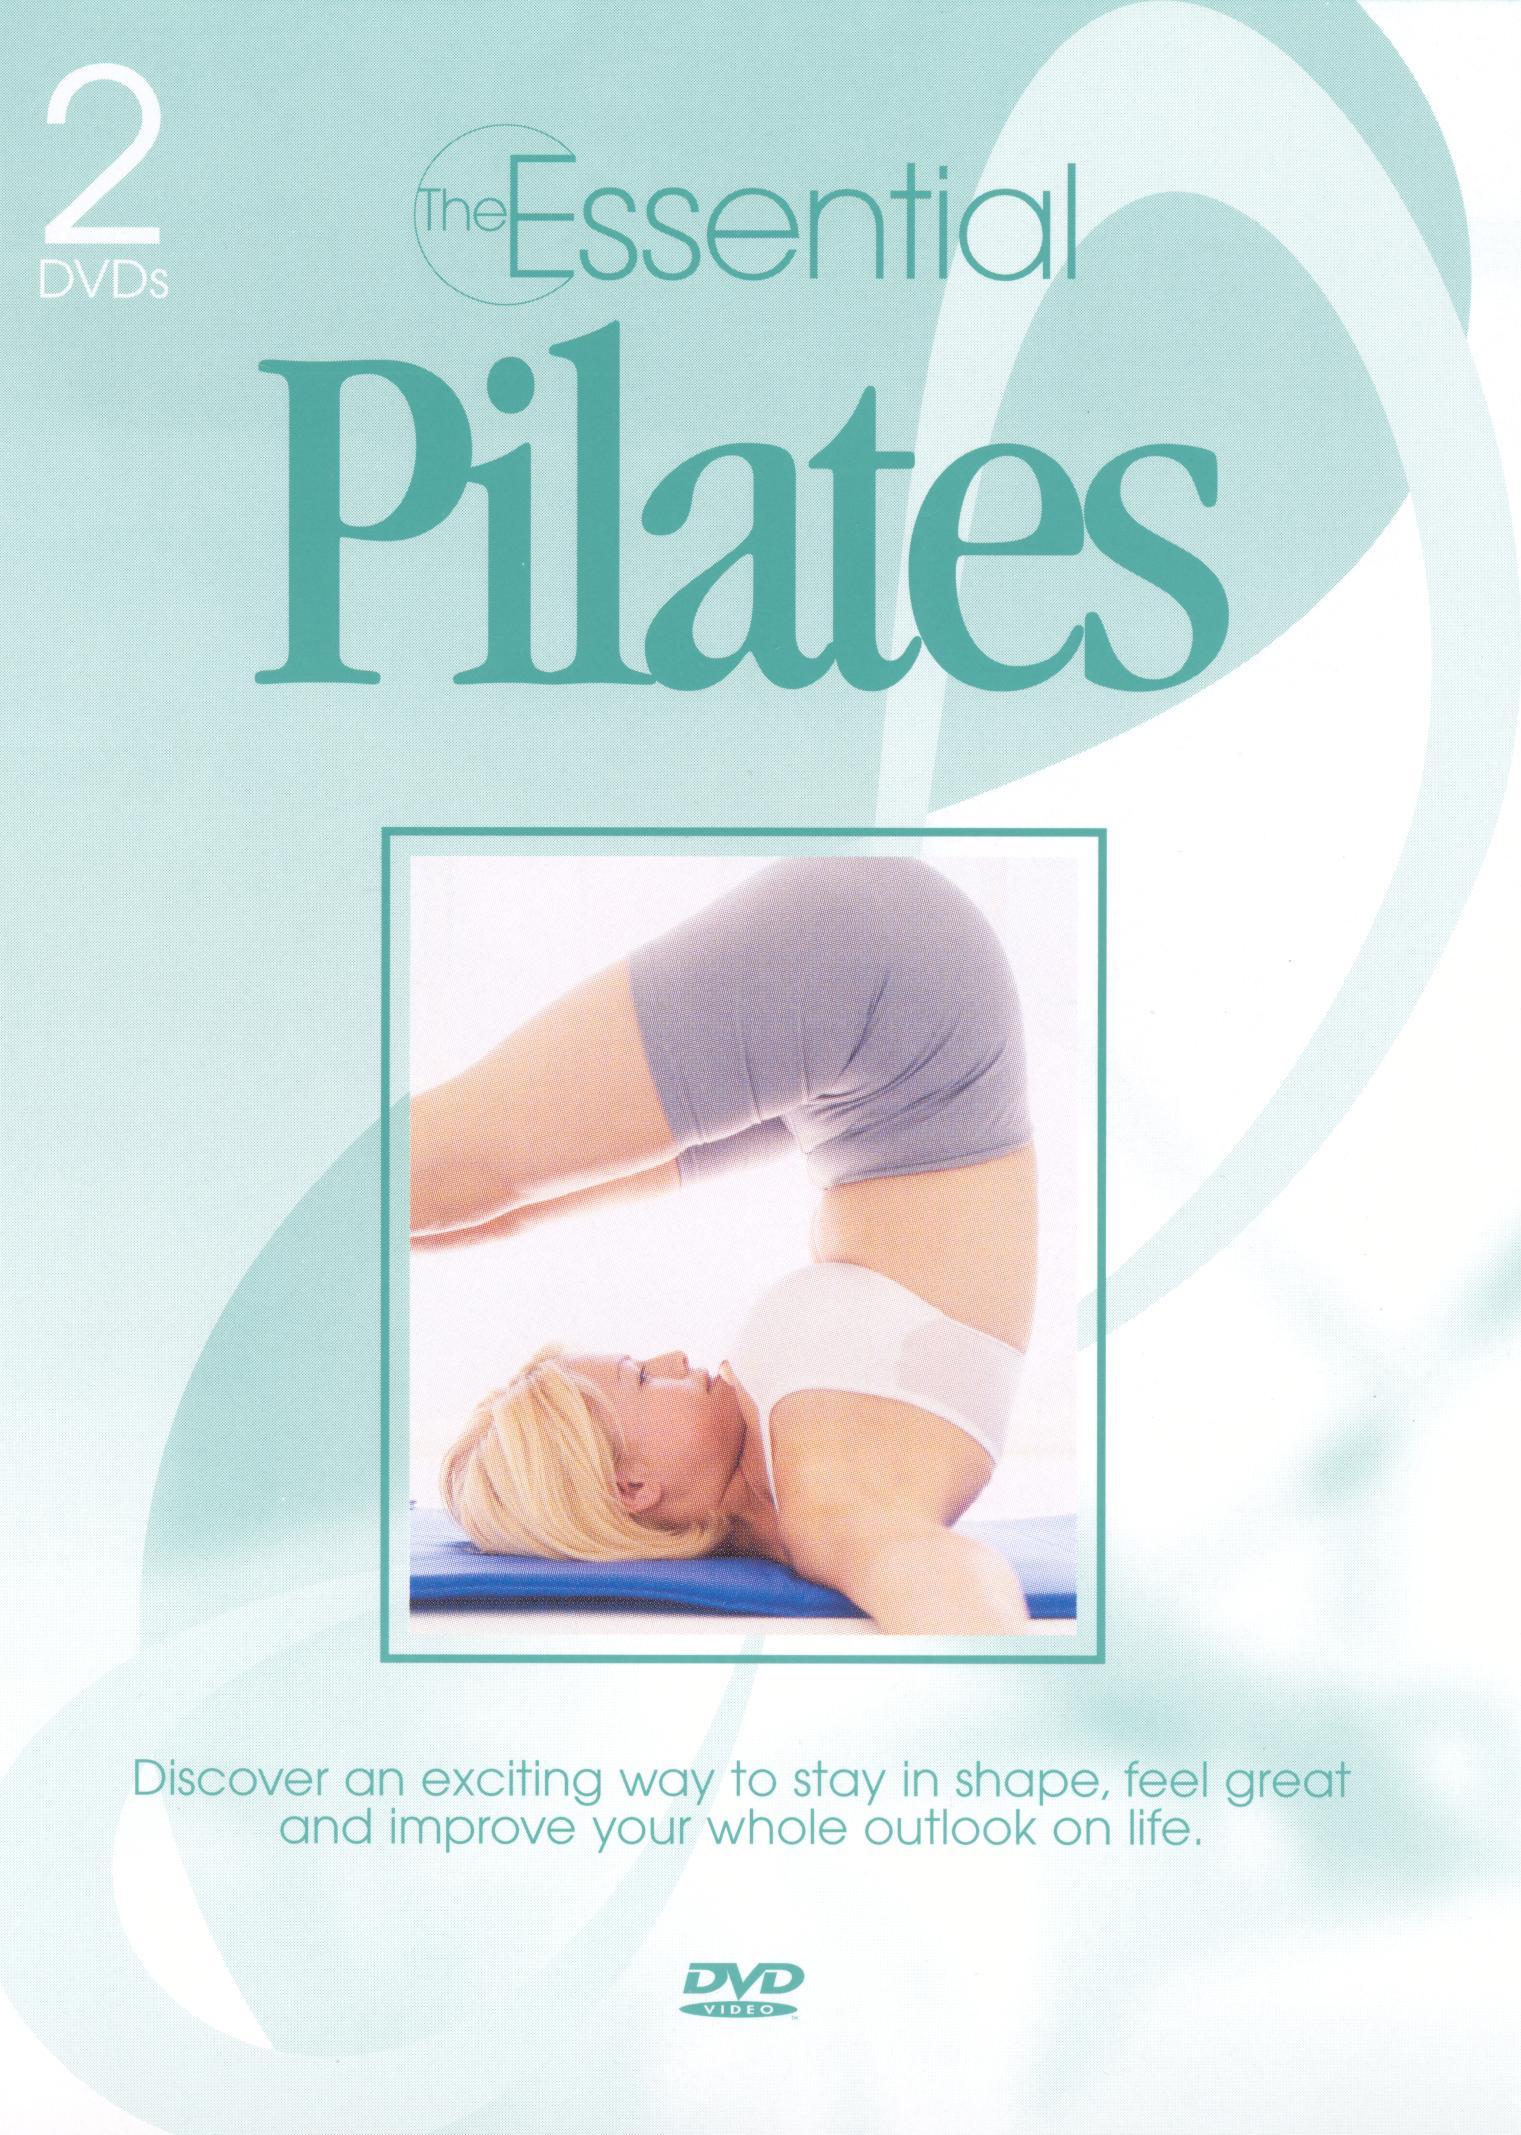 The Essential Pilates